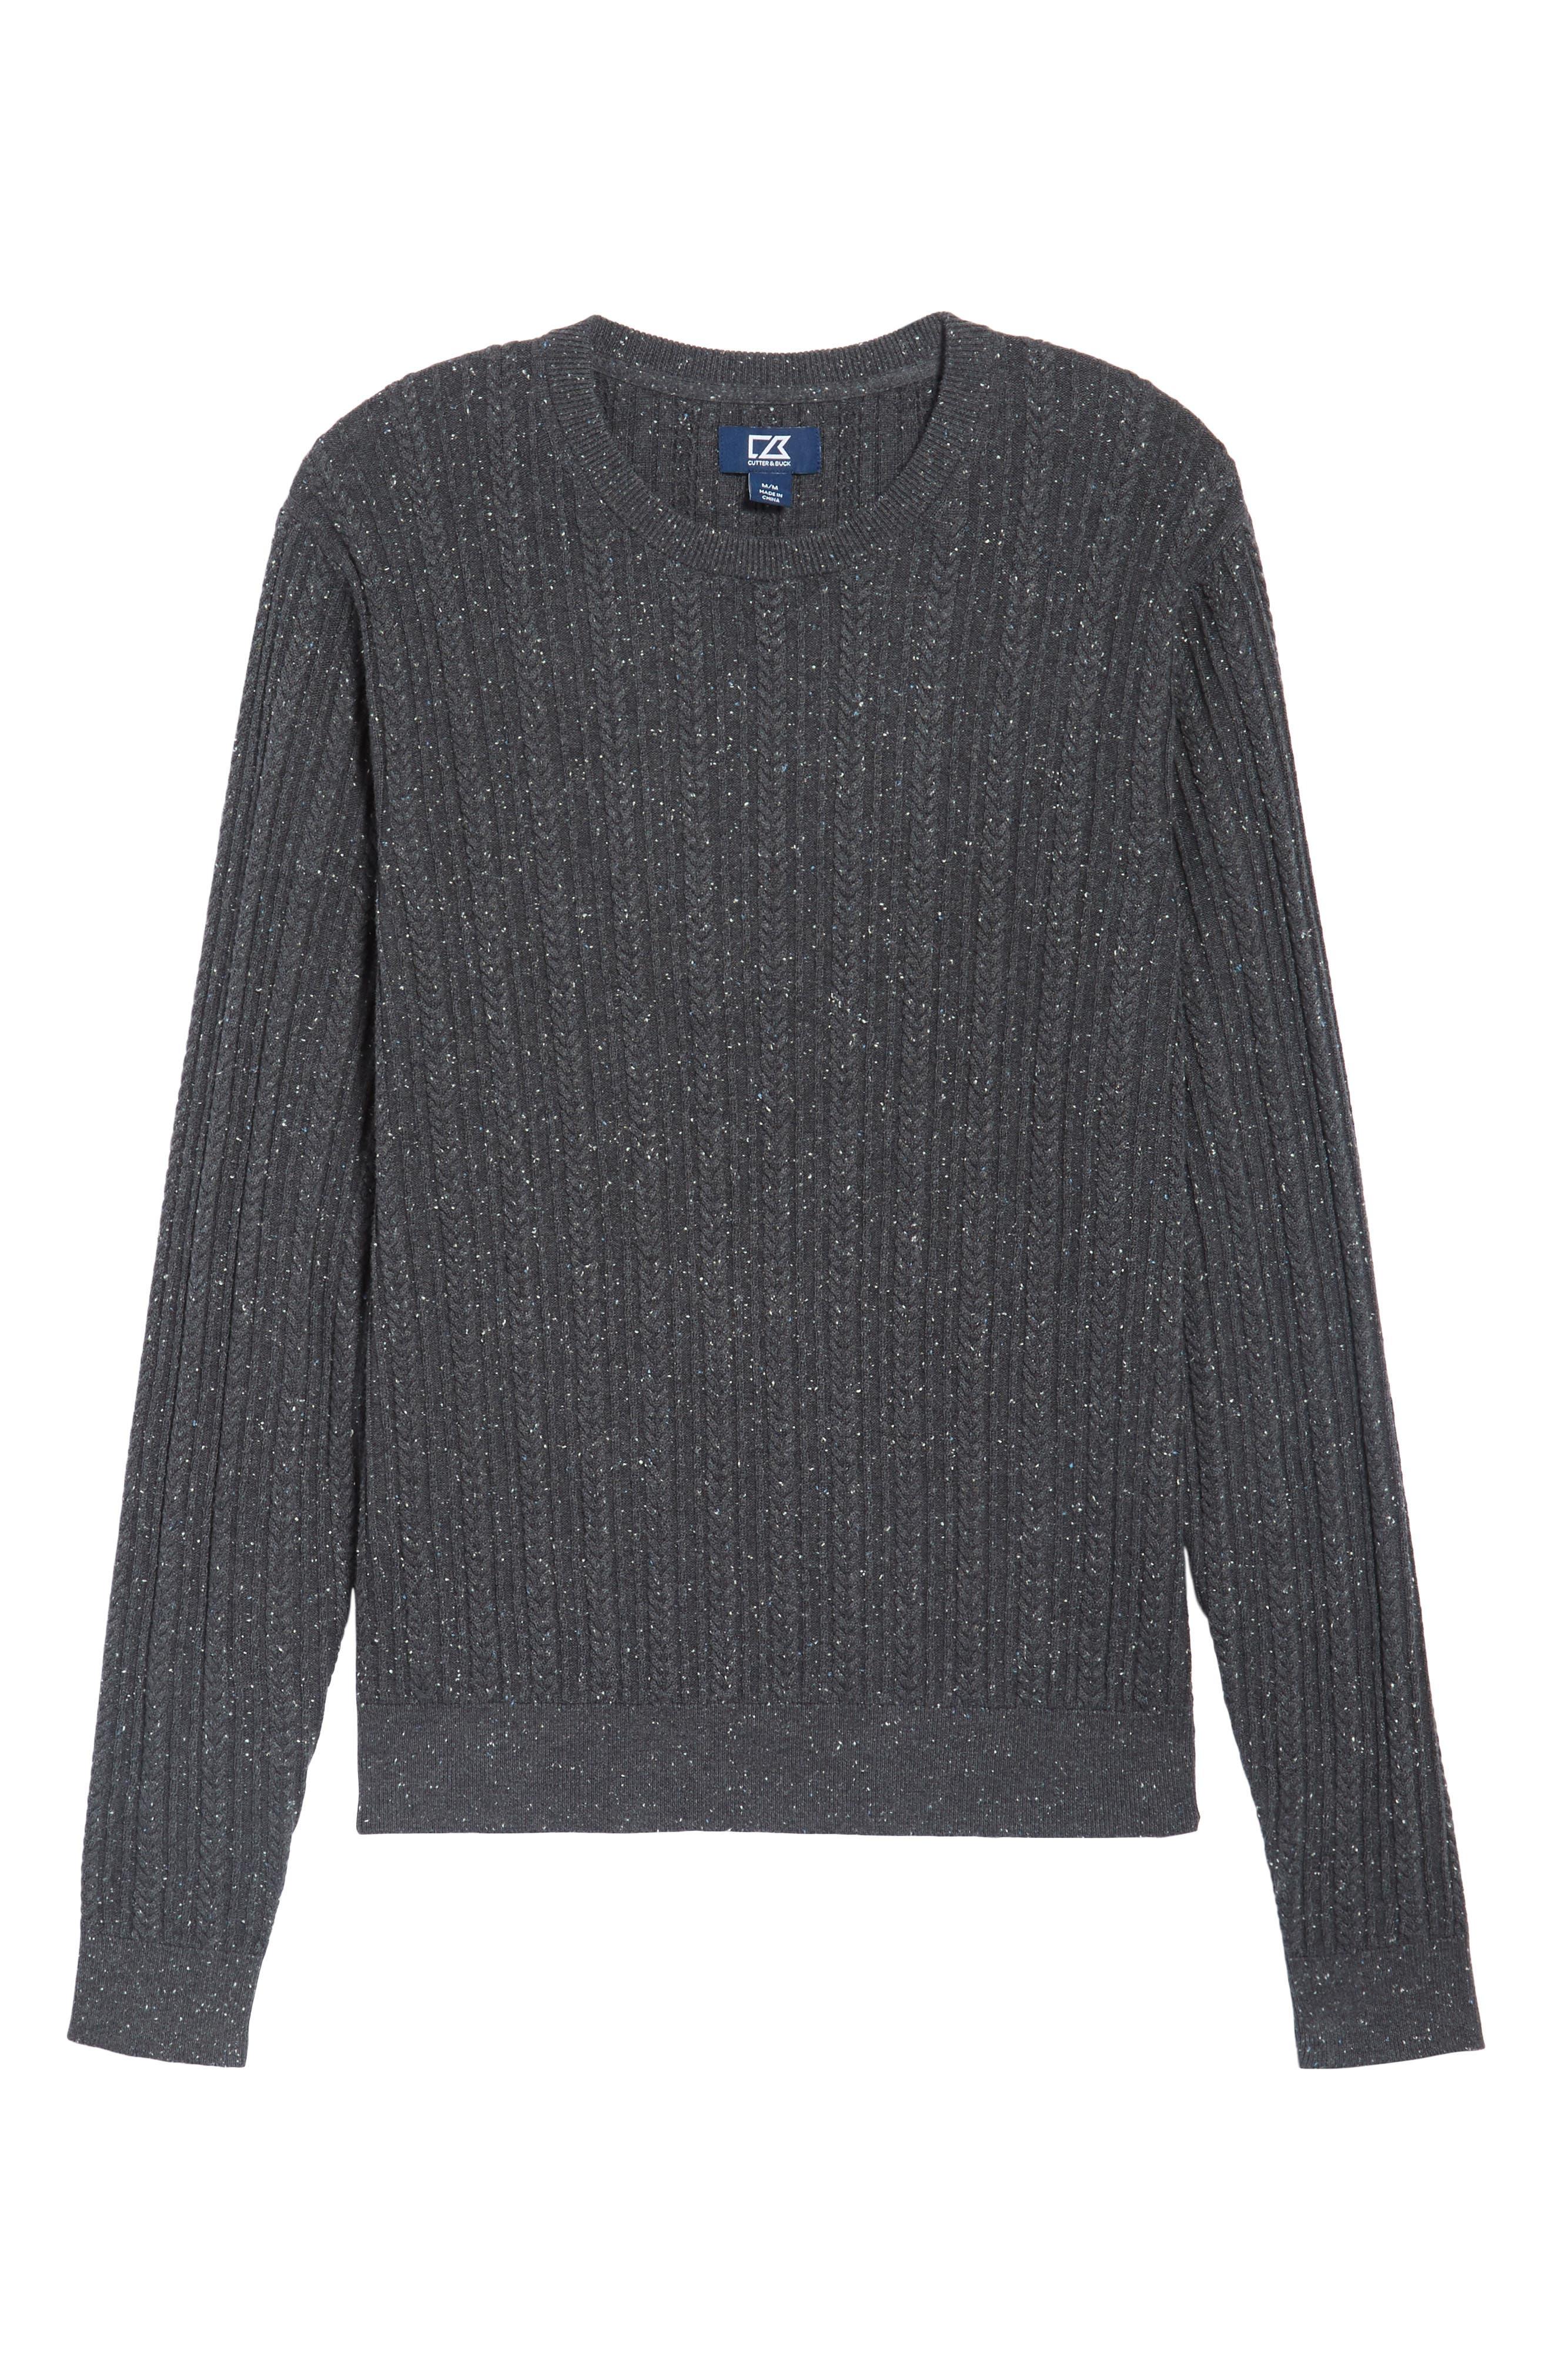 Carlton Crewneck Sweater,                             Alternate thumbnail 6, color,                             020